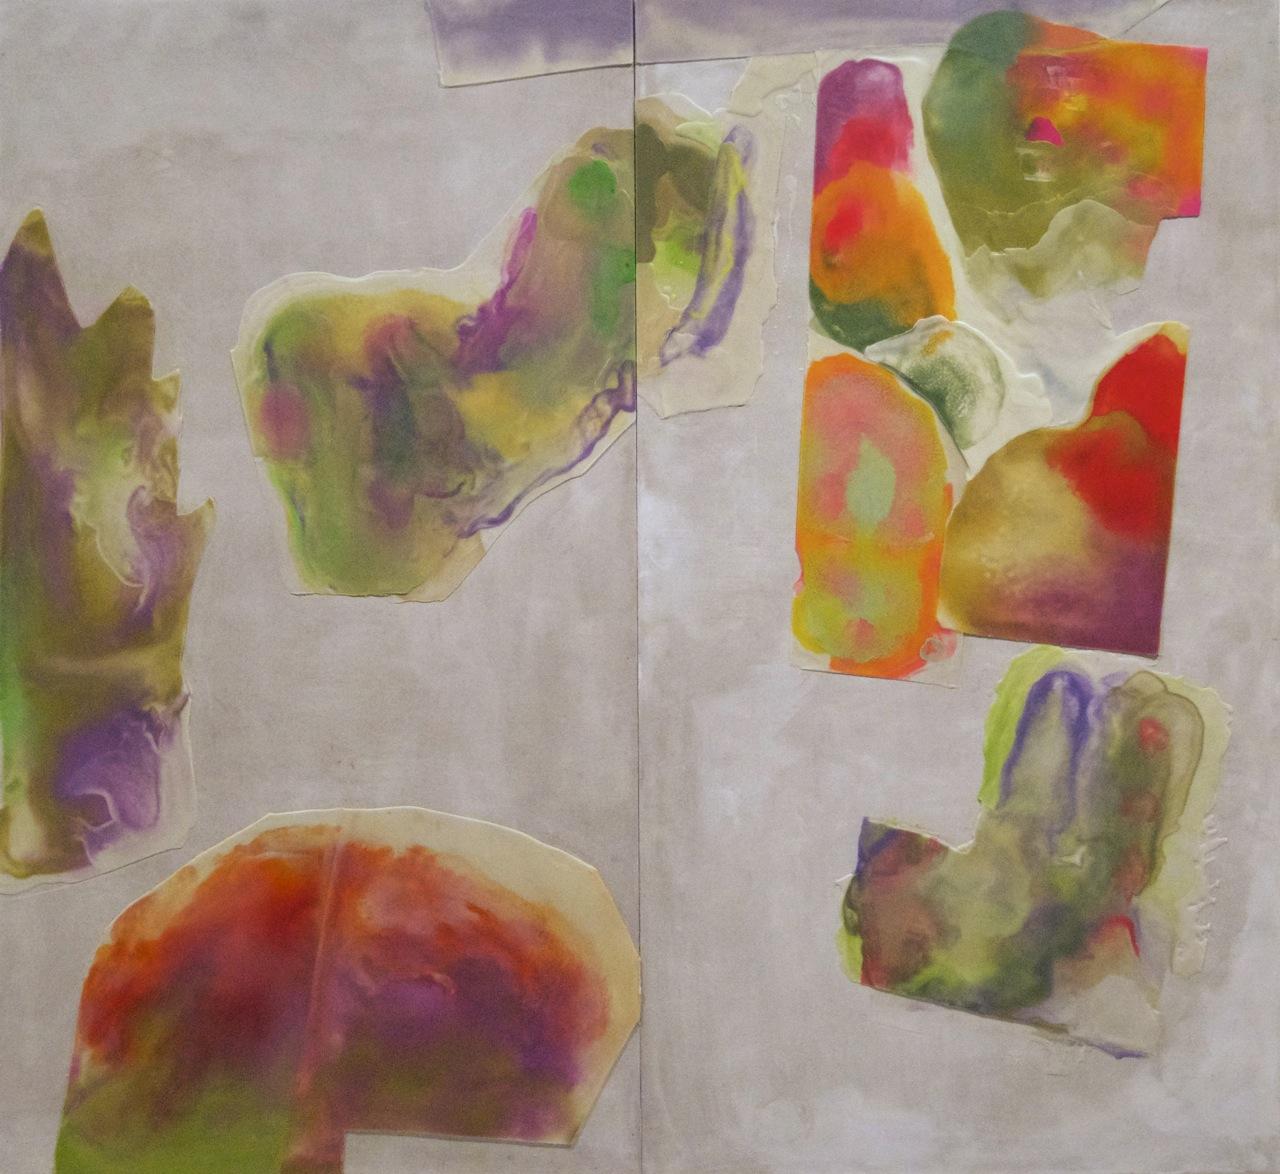 Peter Flaccus, The Islands, 2013, encausto su tavola, cm 183x200